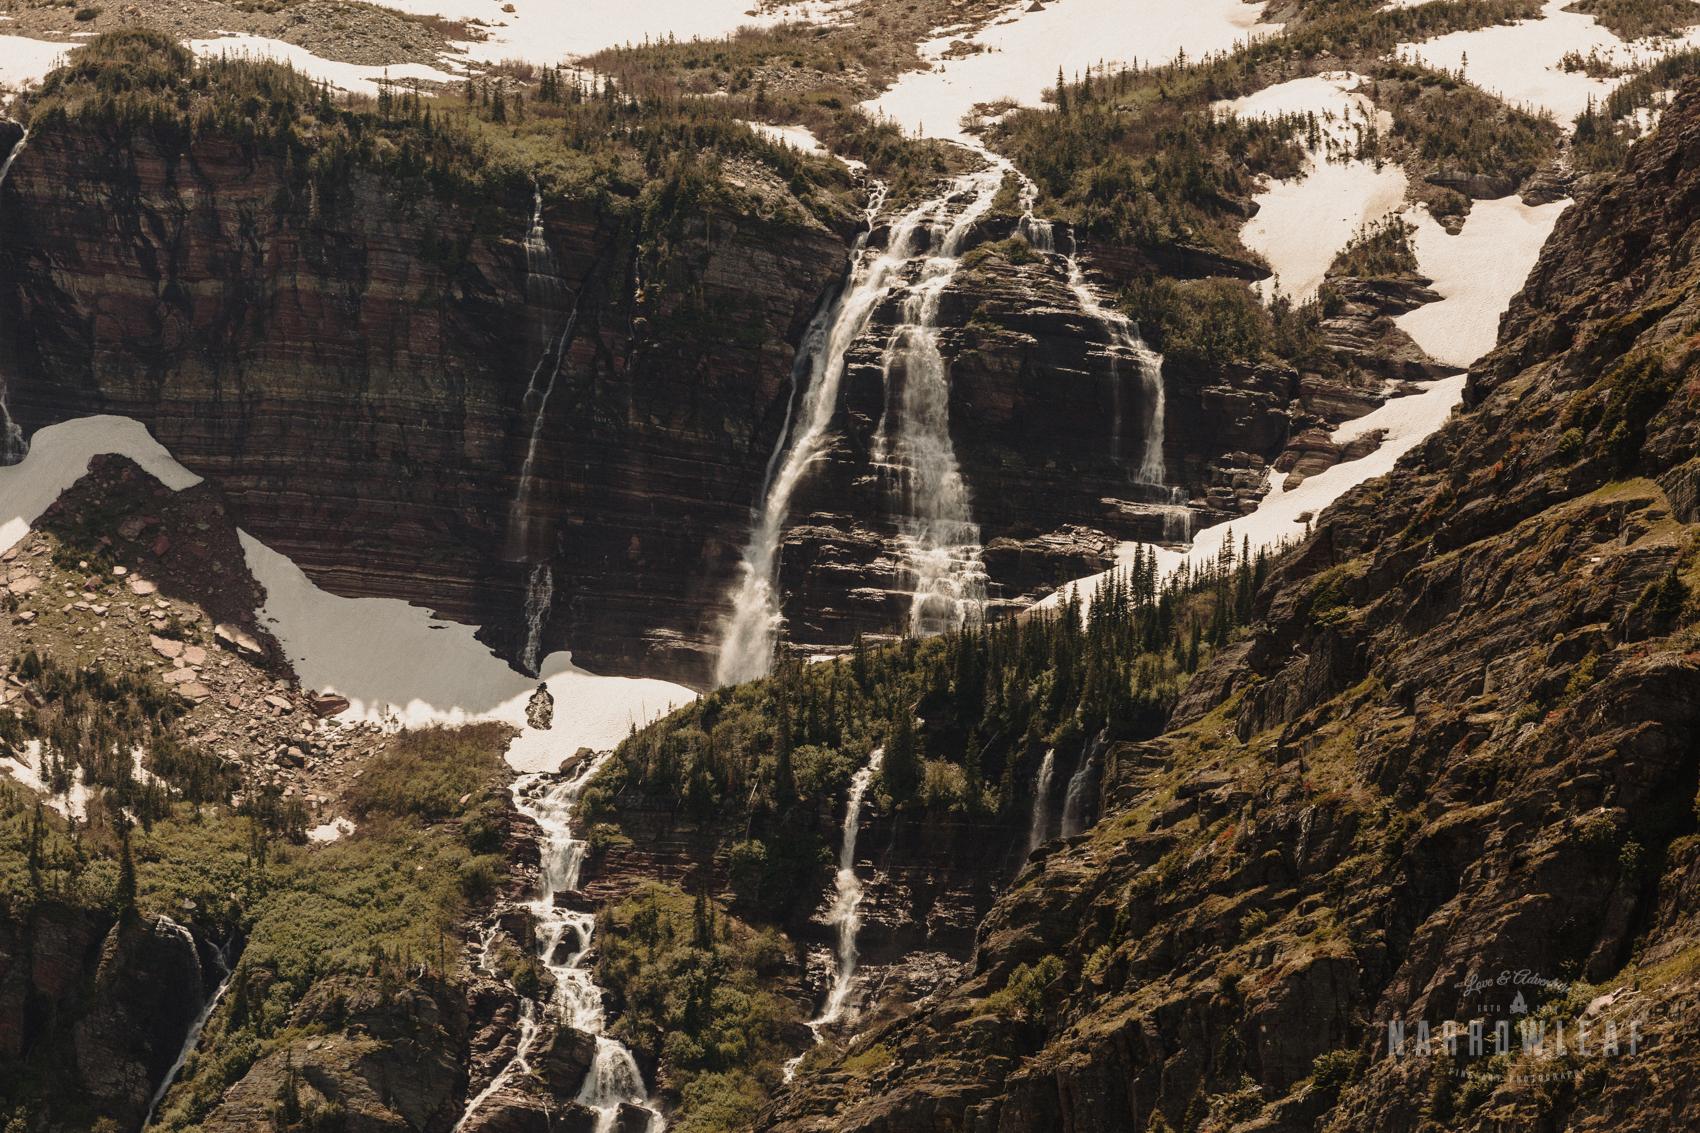 Montana-Glacier-National-Park-Many-Glacier-Narrowleaf-Love-and-Adventure-elopement-Photography-9697.jpg